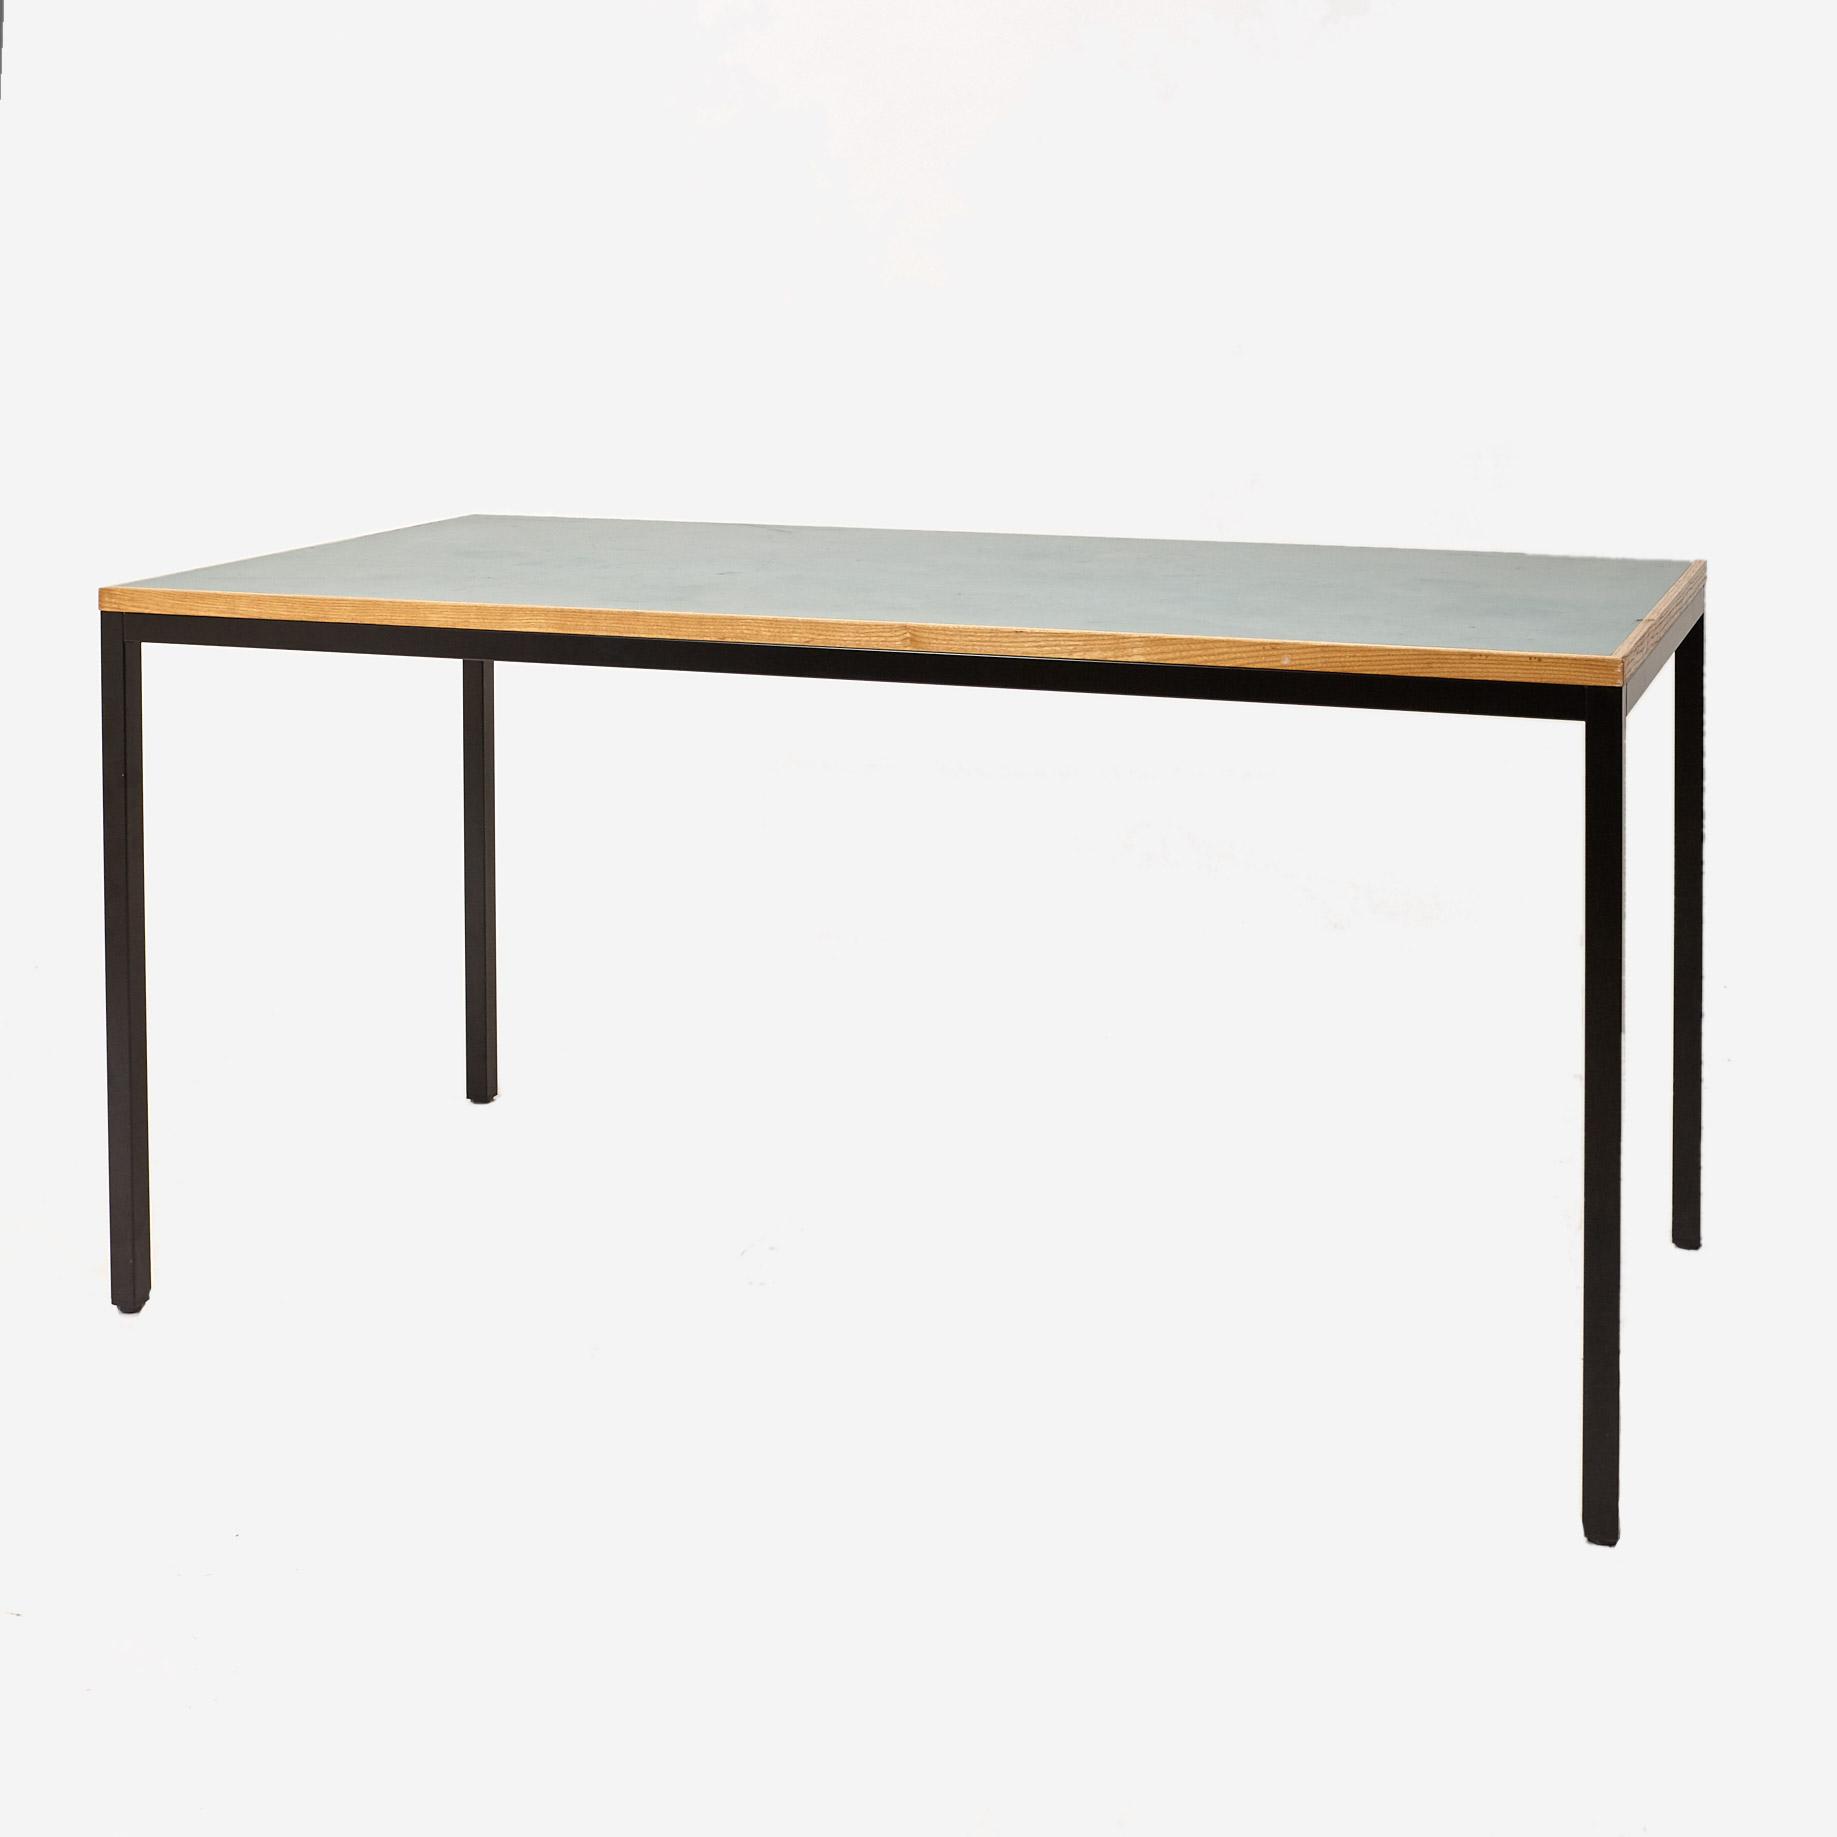 arbeits esstisch von embru ch m bel z rich vintagem bel. Black Bedroom Furniture Sets. Home Design Ideas